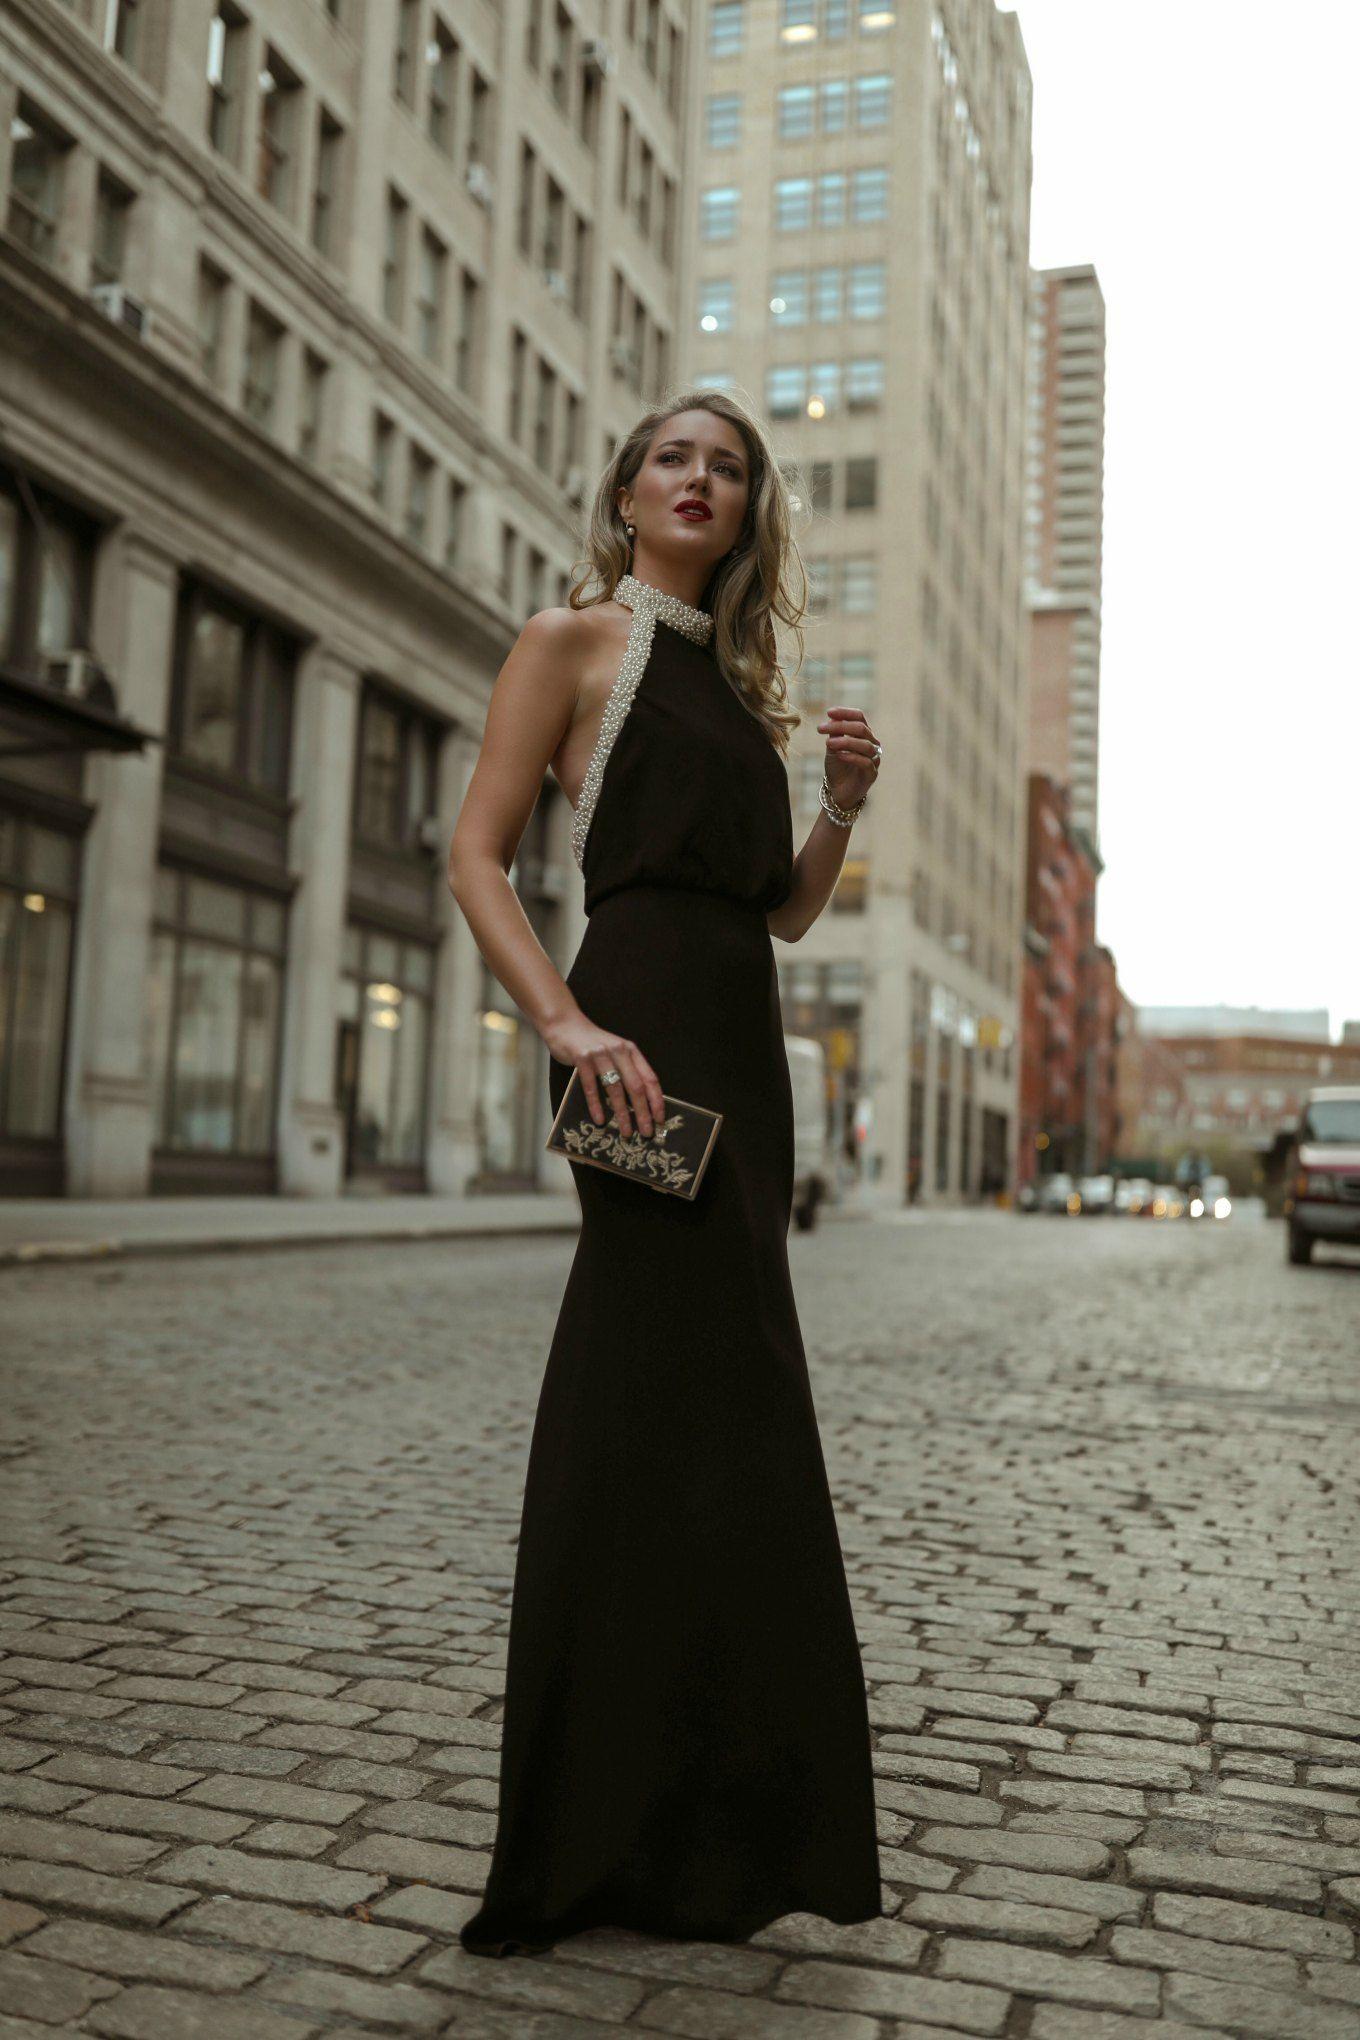 Stunning Rachel Zoe Long Black Dress With Pearl Halter Neckline And Minza Khan Gold Black Evening Gown Black Tie Event Dresses Black Tie Wedding Guest Dress [ 2040 x 1360 Pixel ]